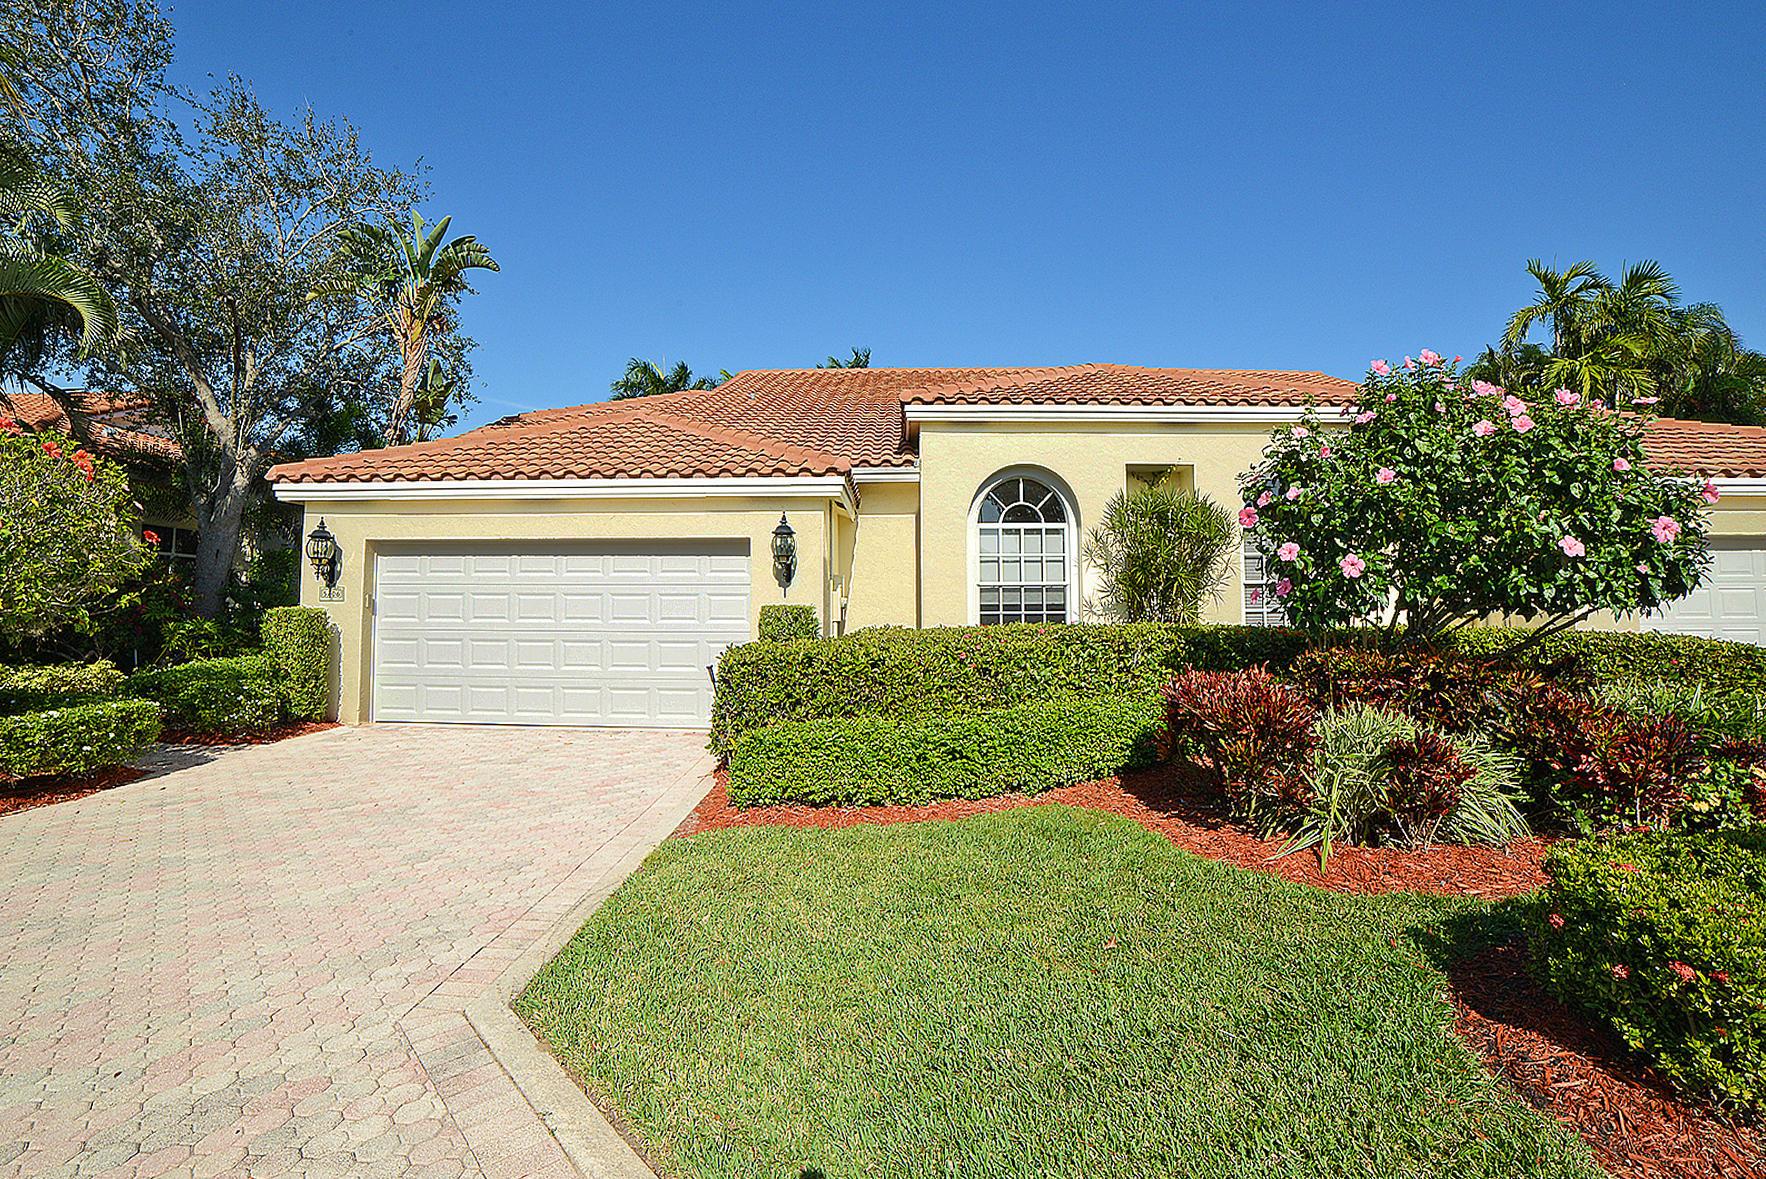 5706 Nw 24th Terrace Boca Raton, FL 33496